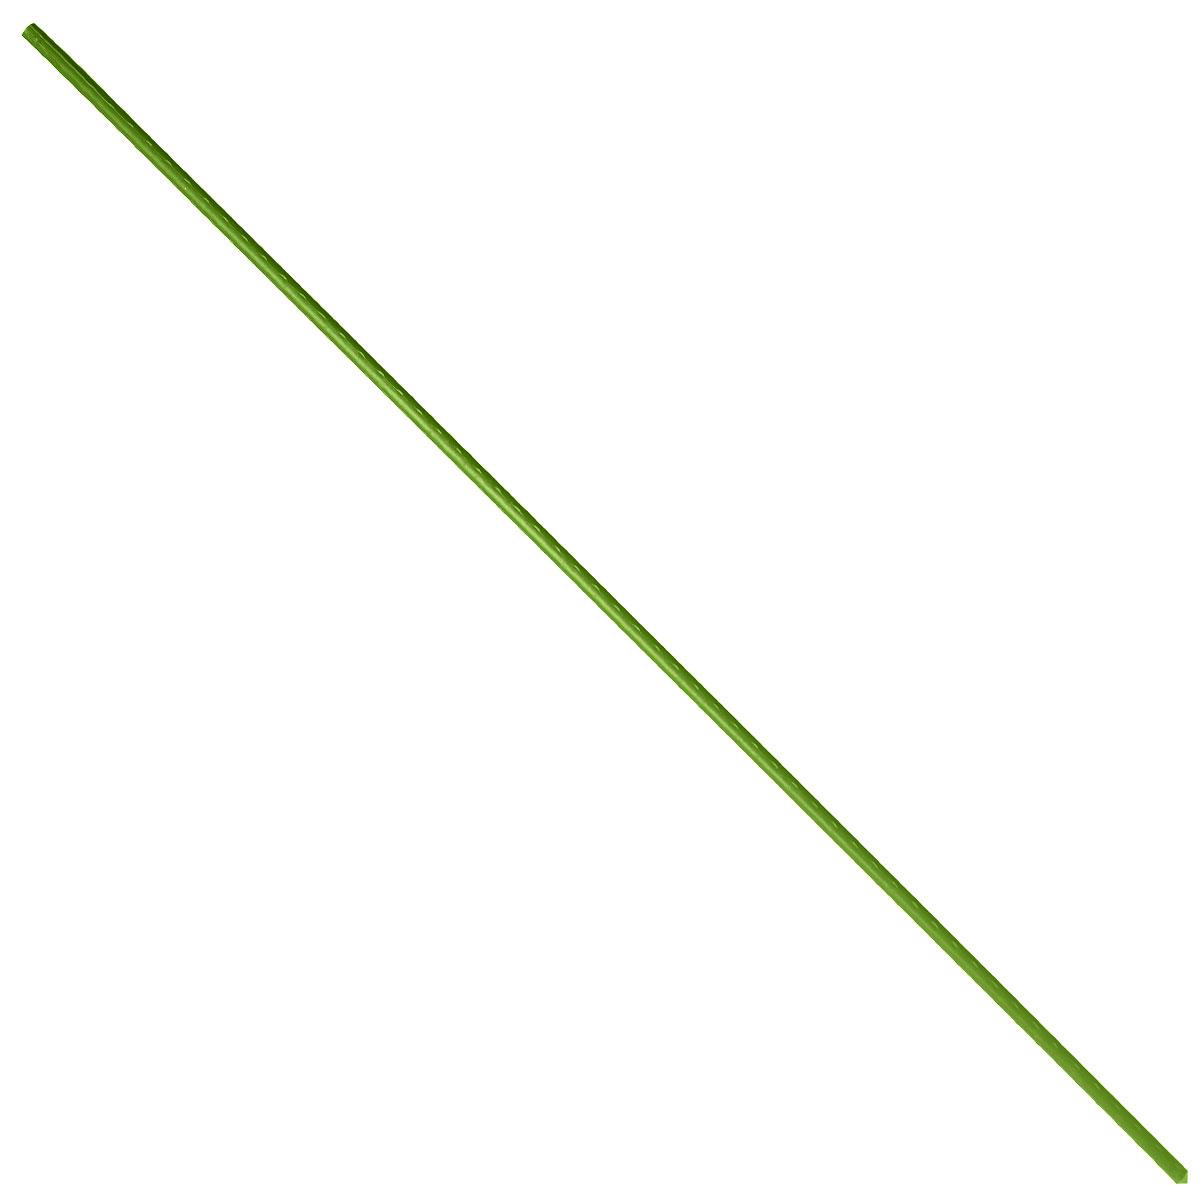 Опора для растений Green Apple, цвет: зеленый, диаметр 0,8 см, длина 60 см, 5 шт комплект для вьющихся растений сборный green apple glscl